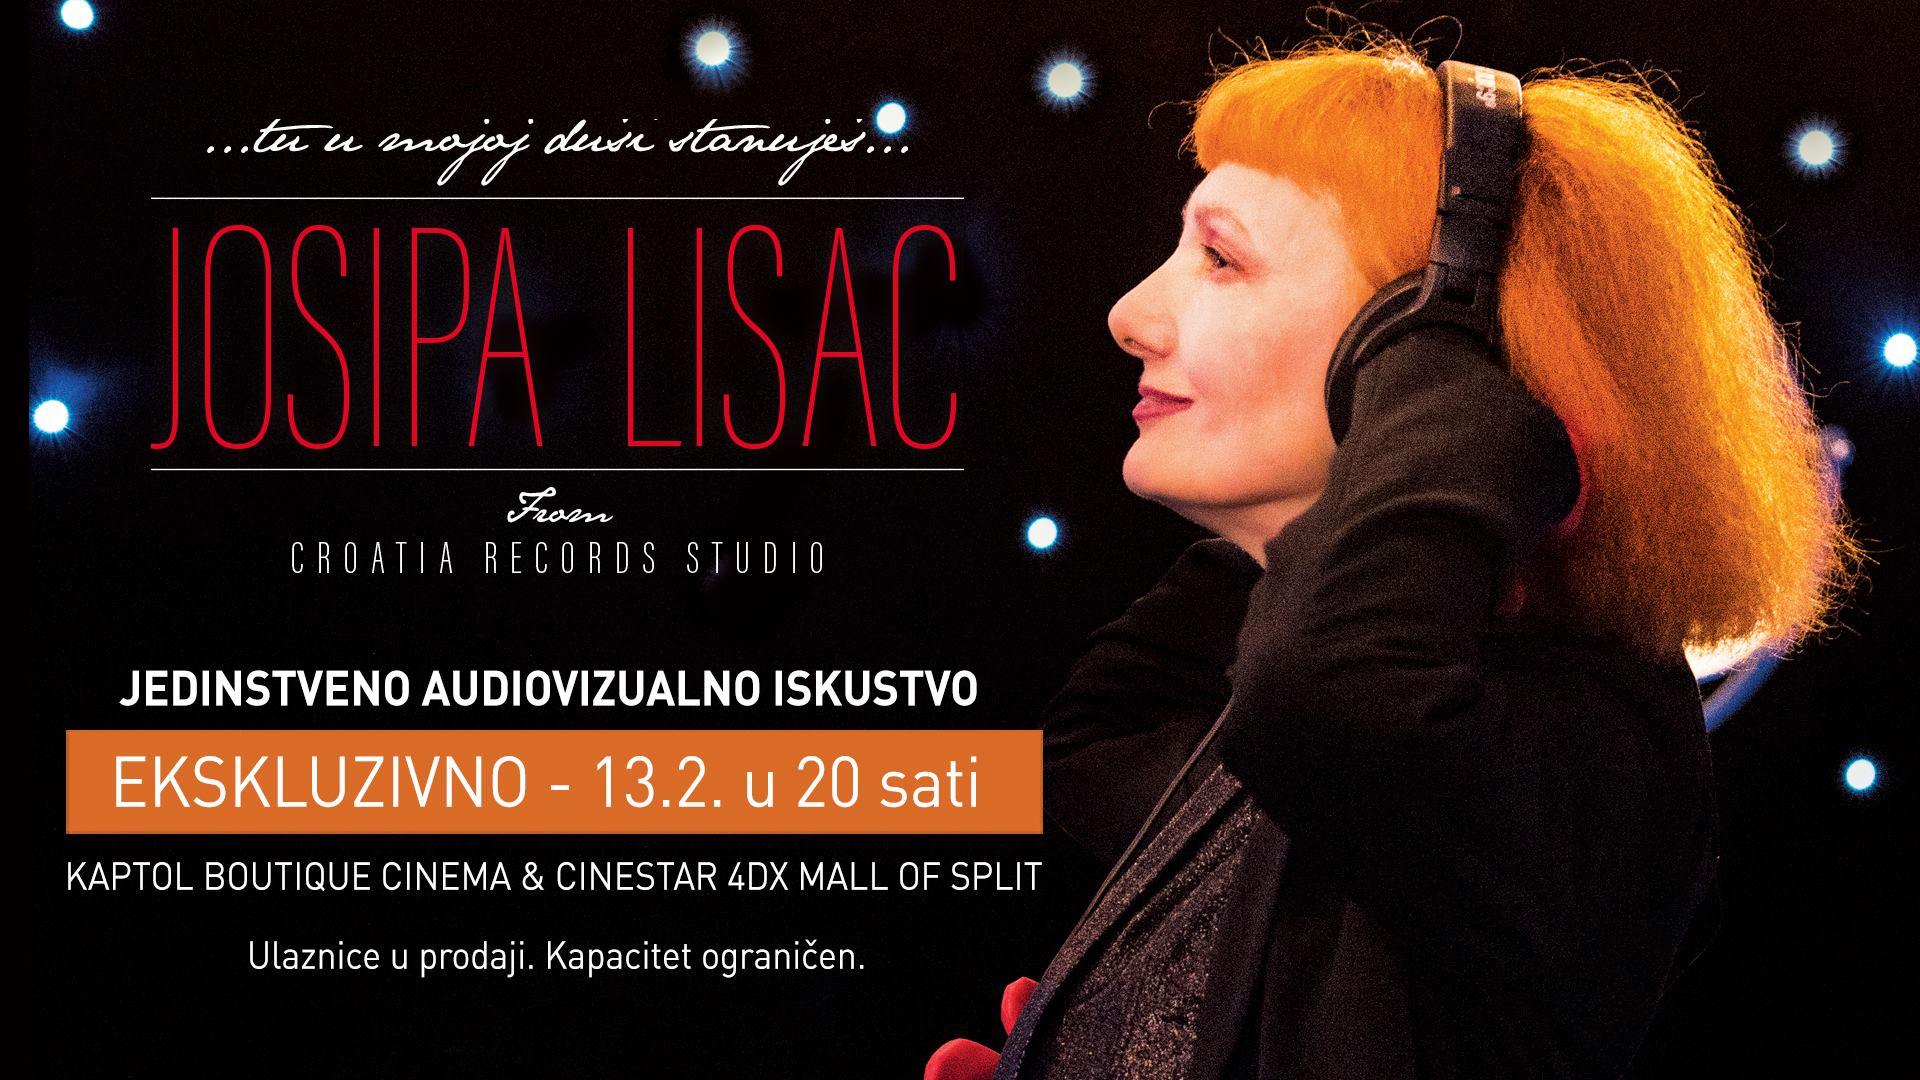 Glazbeni film s divom Josipom Lisac